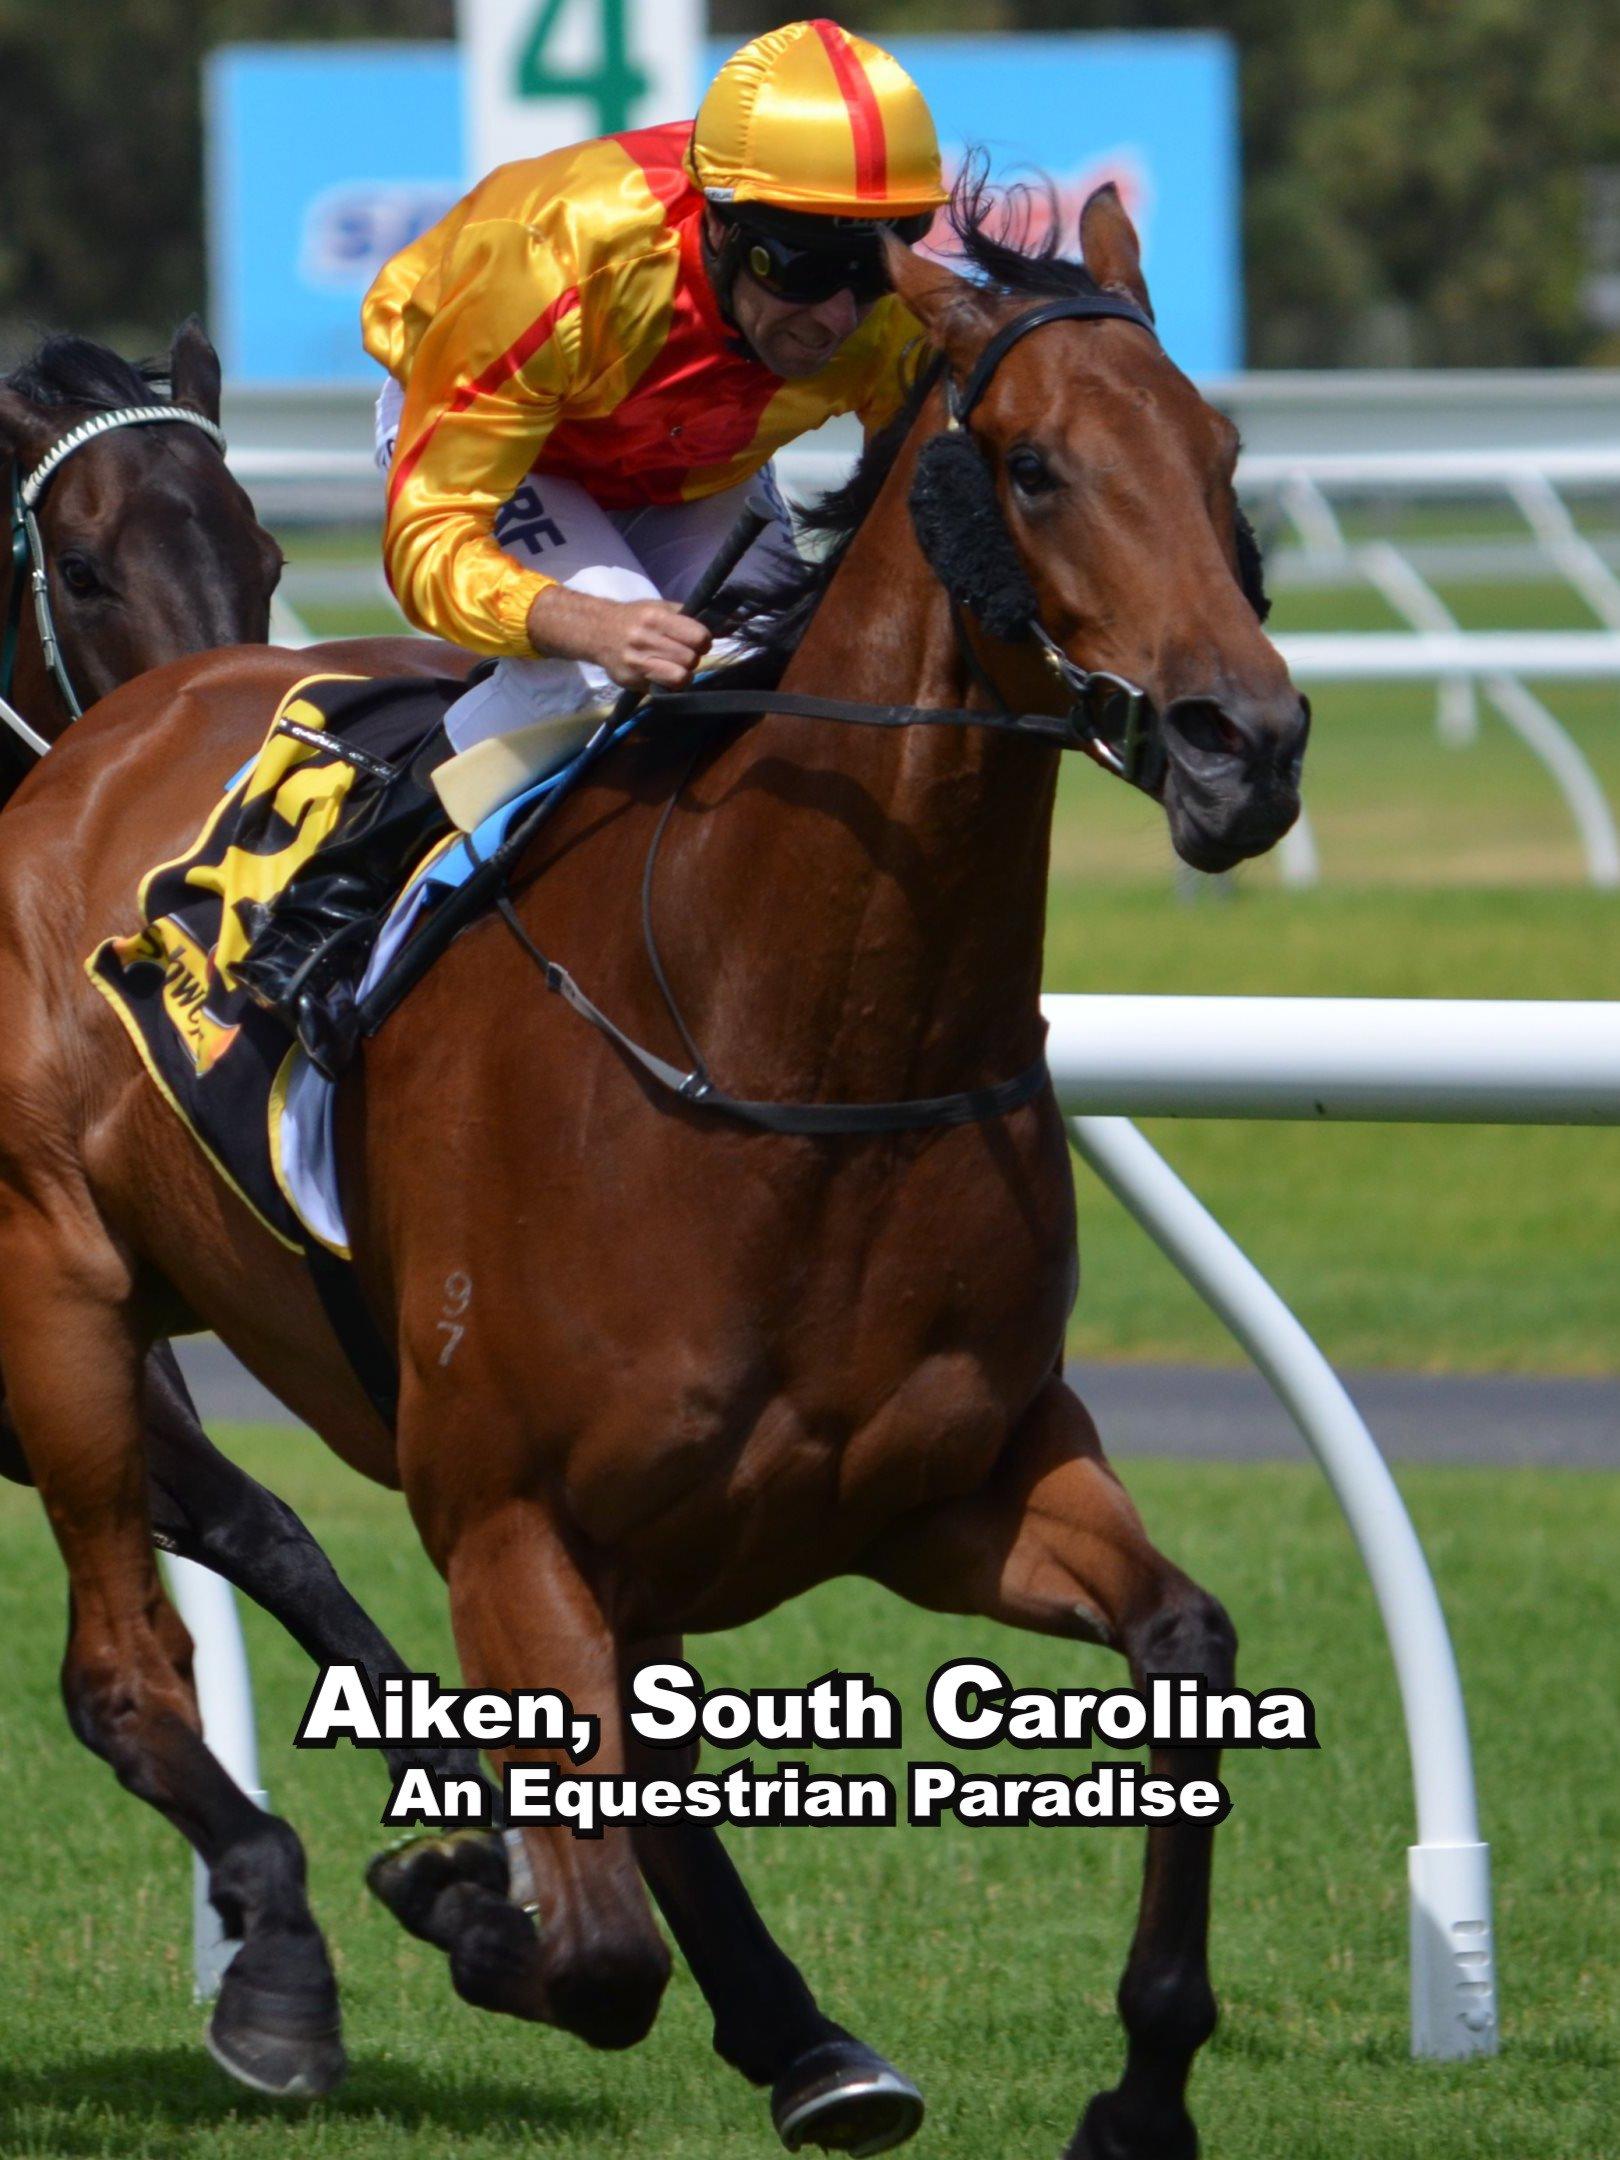 Aiken, South Carolina: An Equestrian Paradise